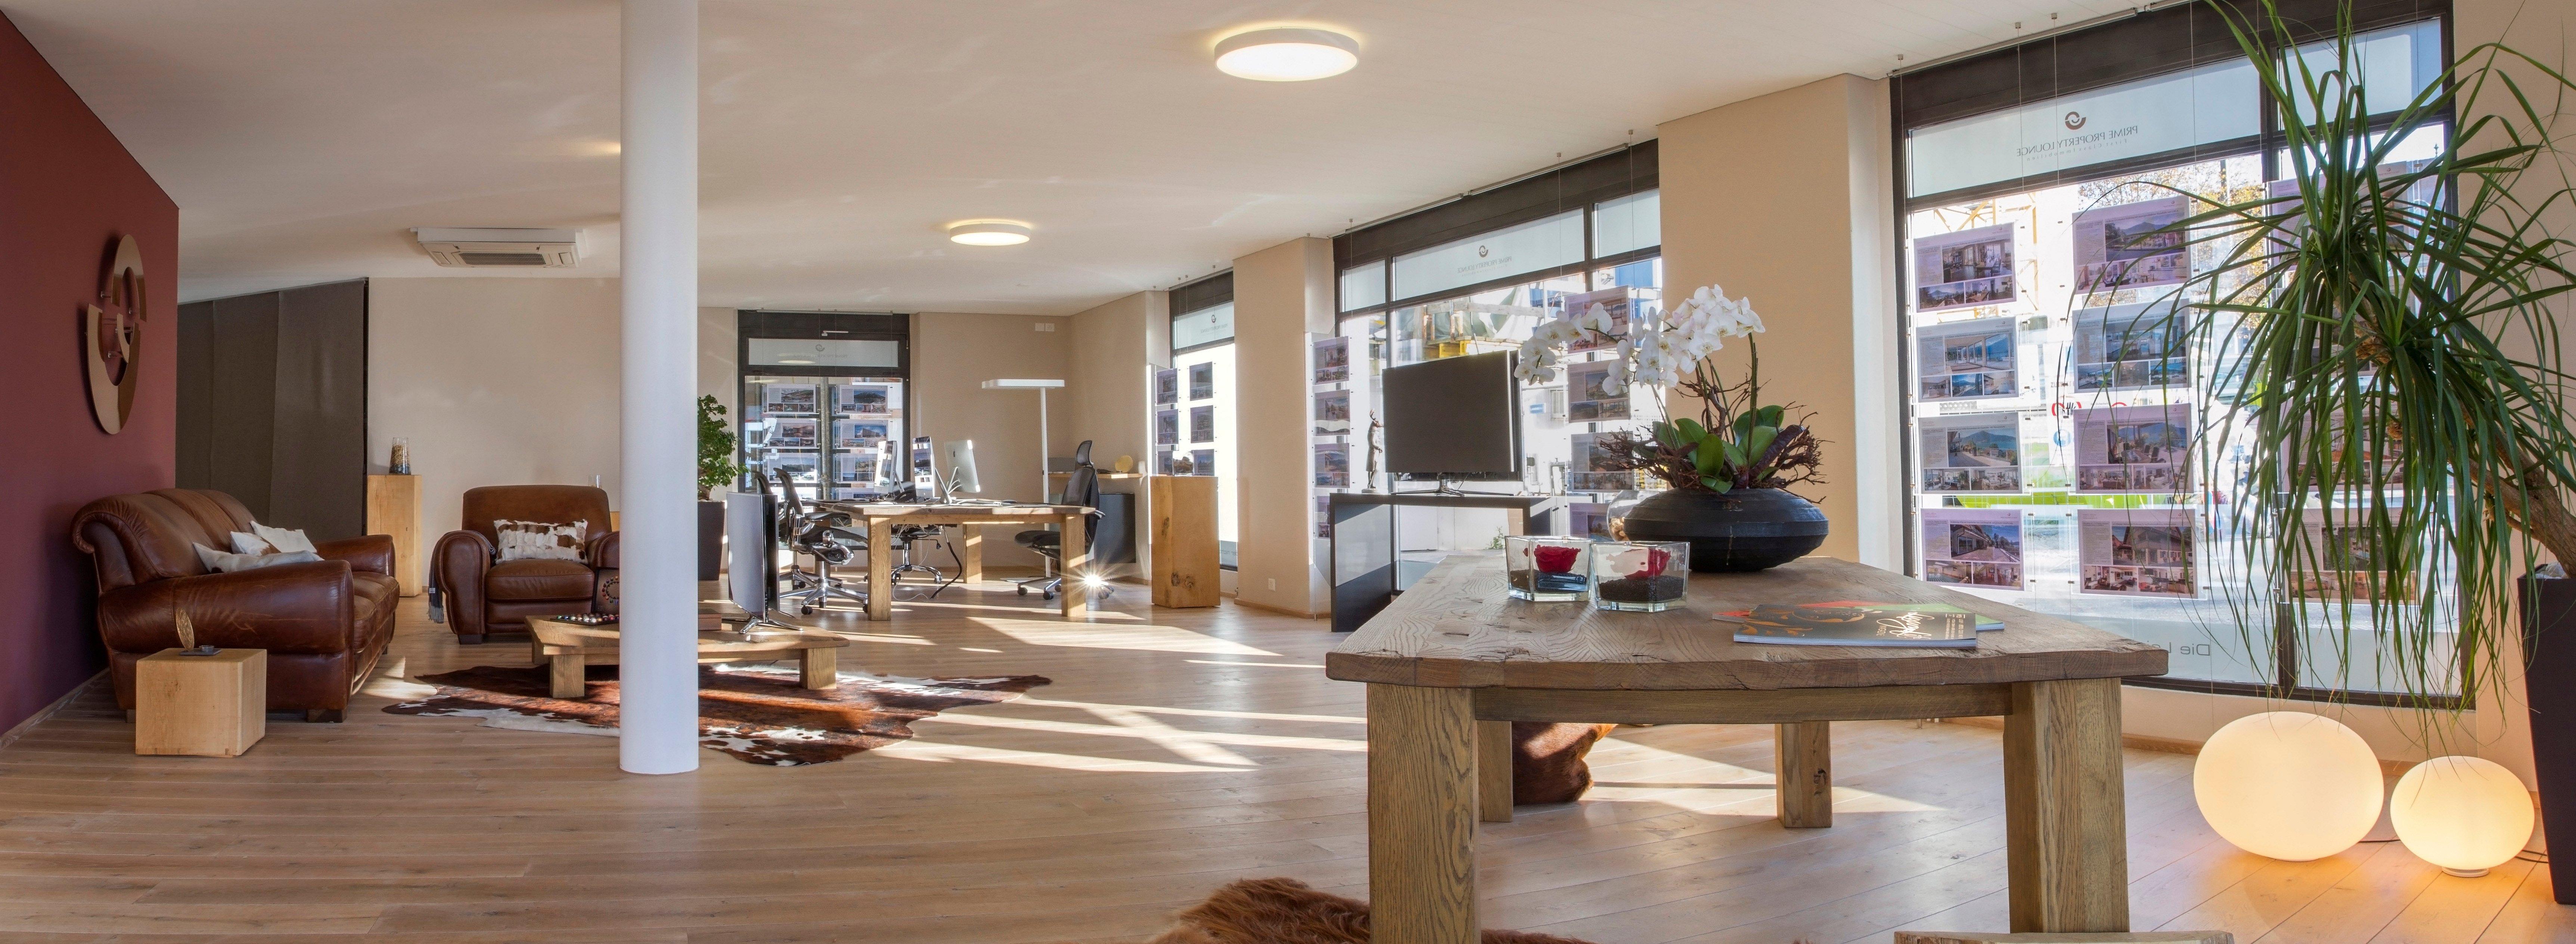 Prime Property Lounge